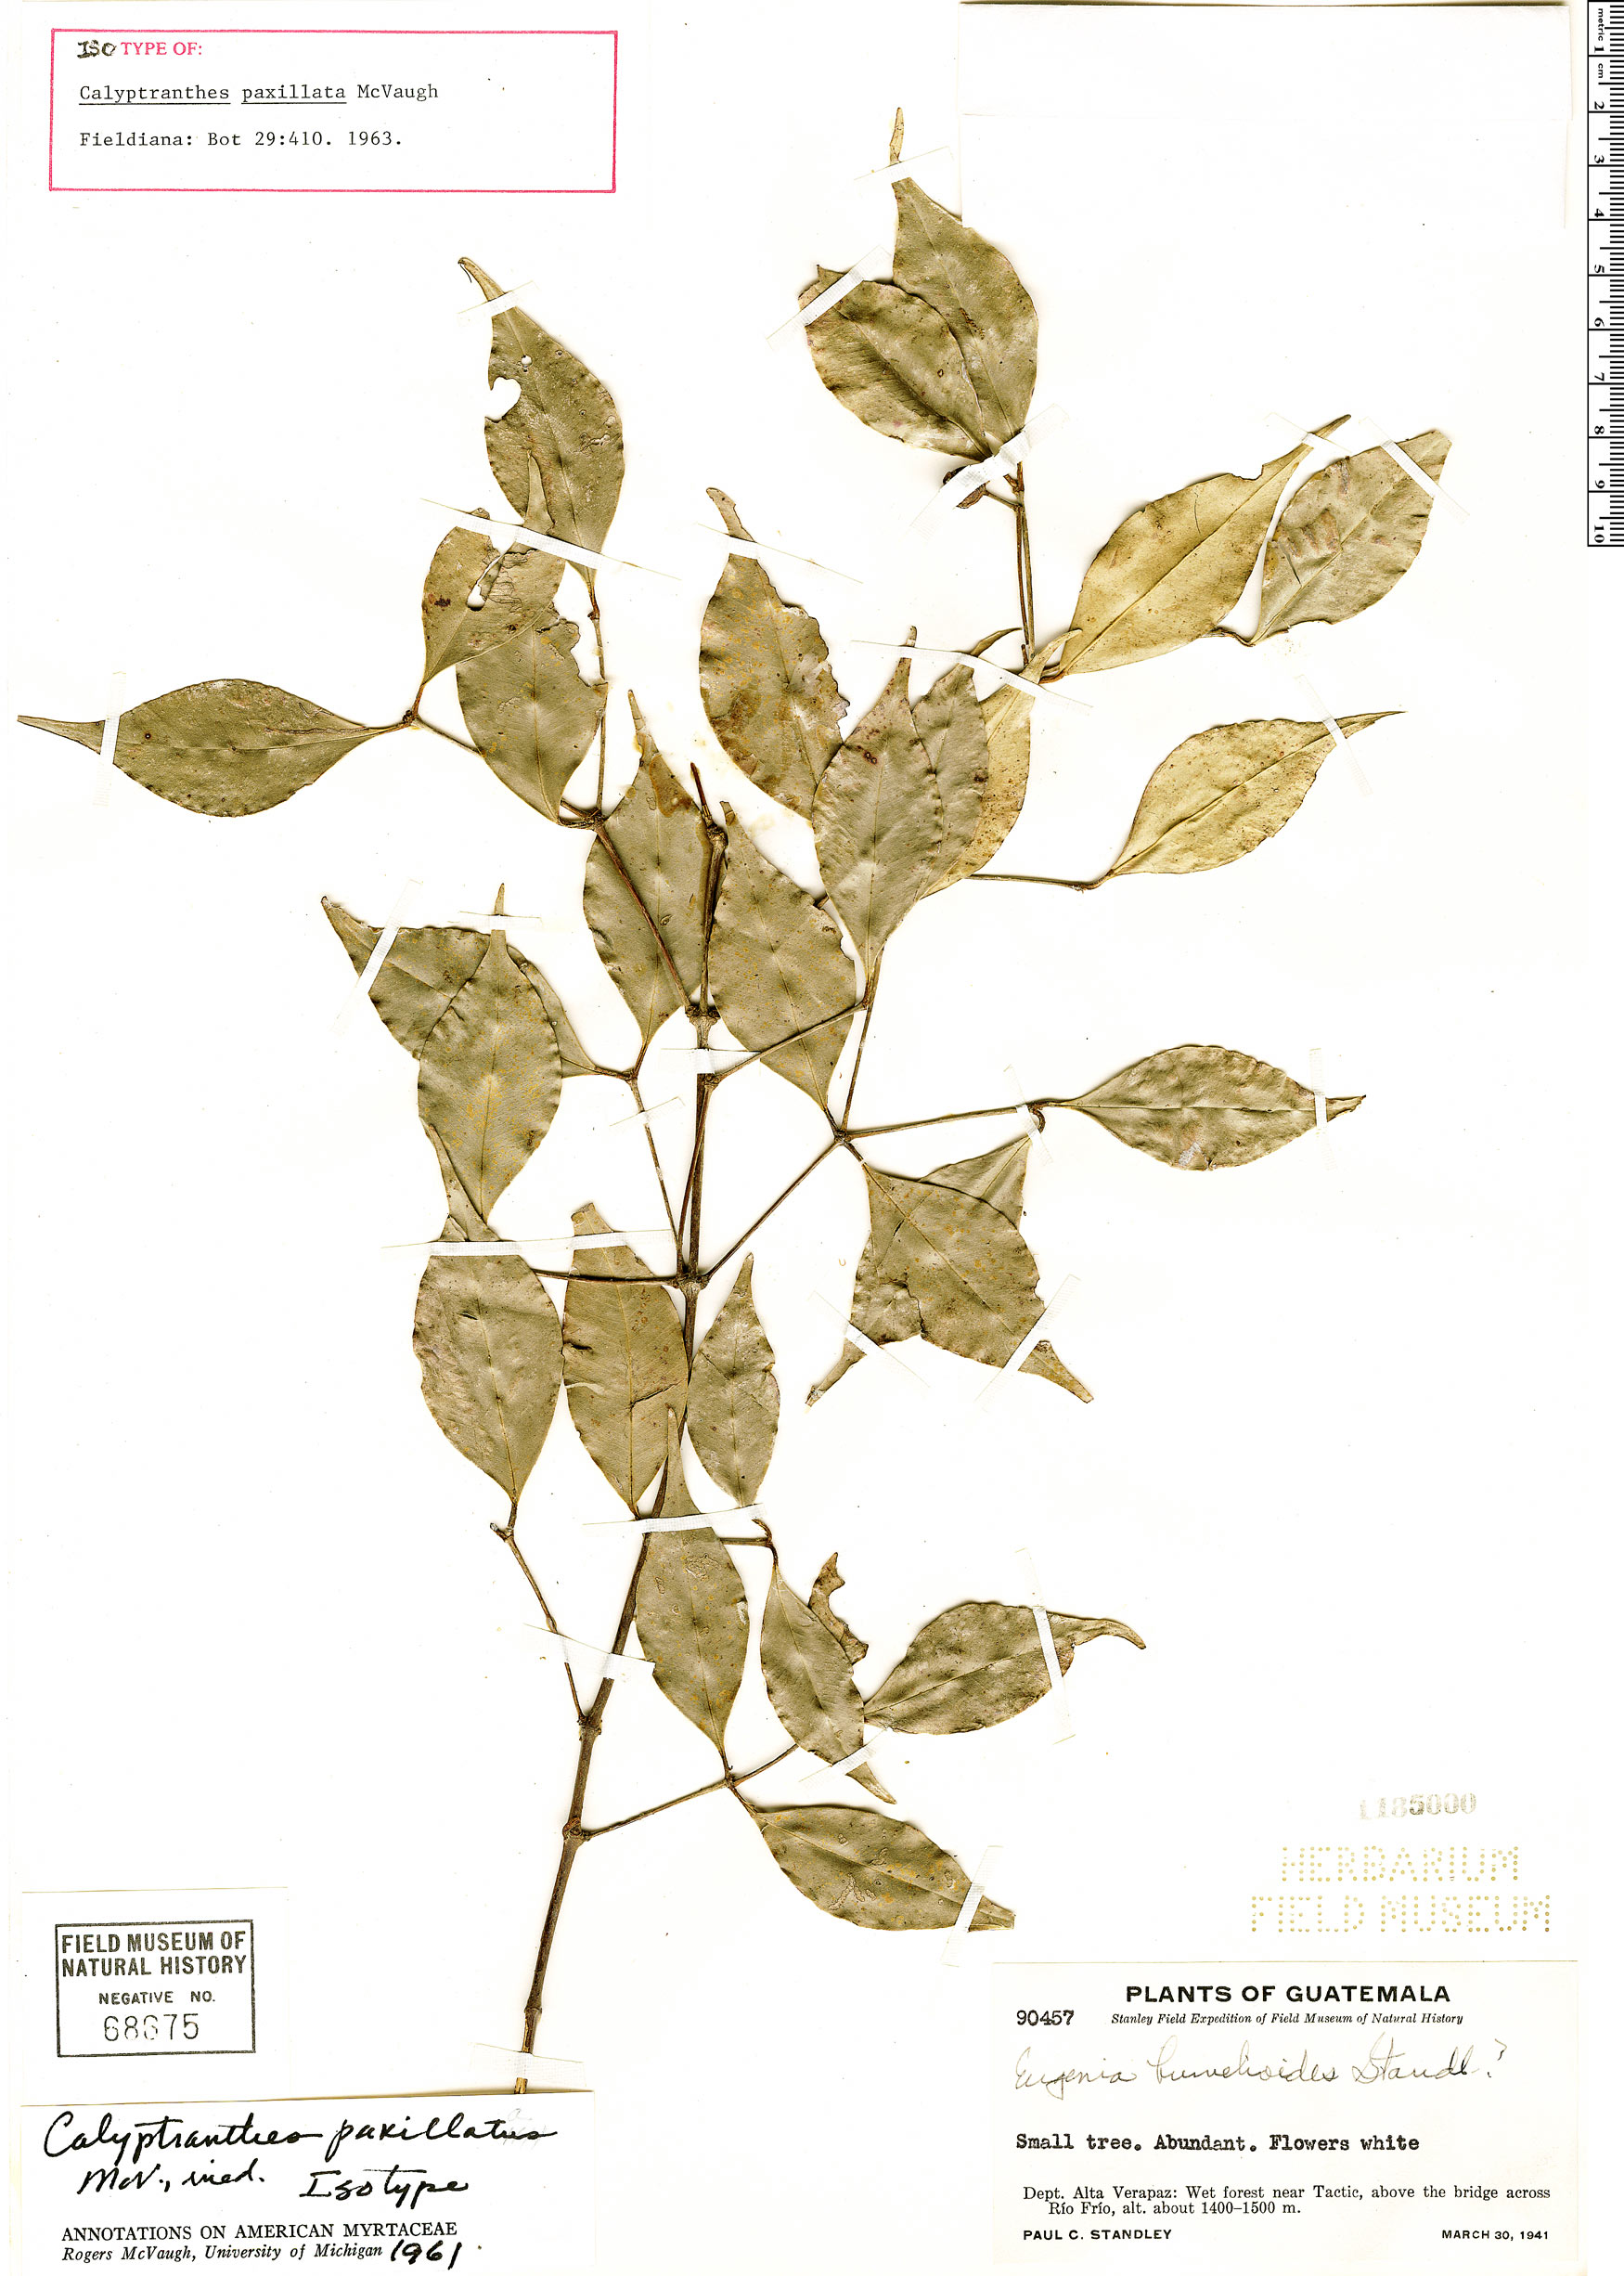 Specimen: Calyptranthes paxillata